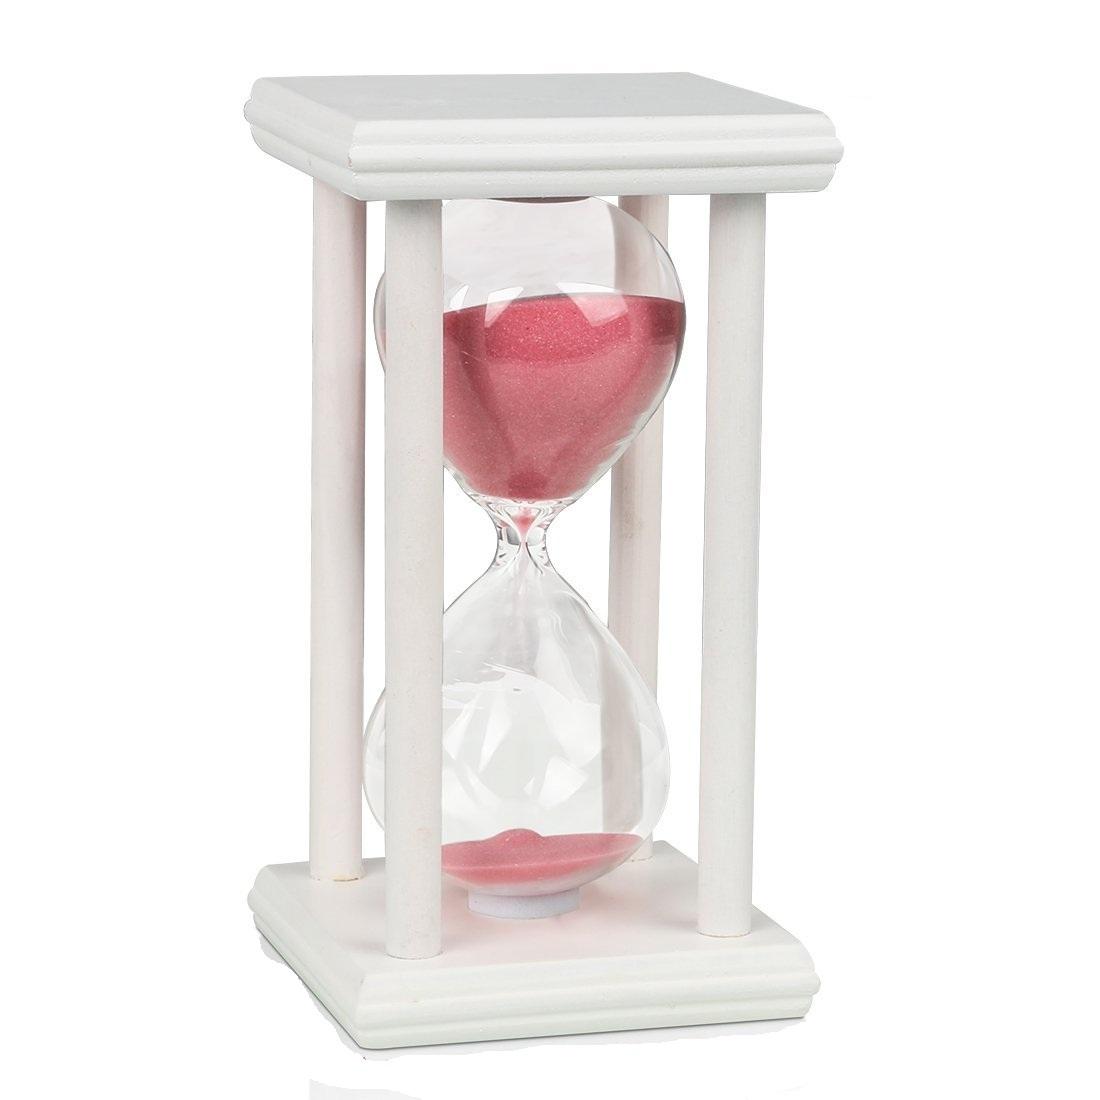 30-60-minutos-Rectangular-Madera-Arena-Cristal-Reloj-de-Decoracion-Hogar-GB